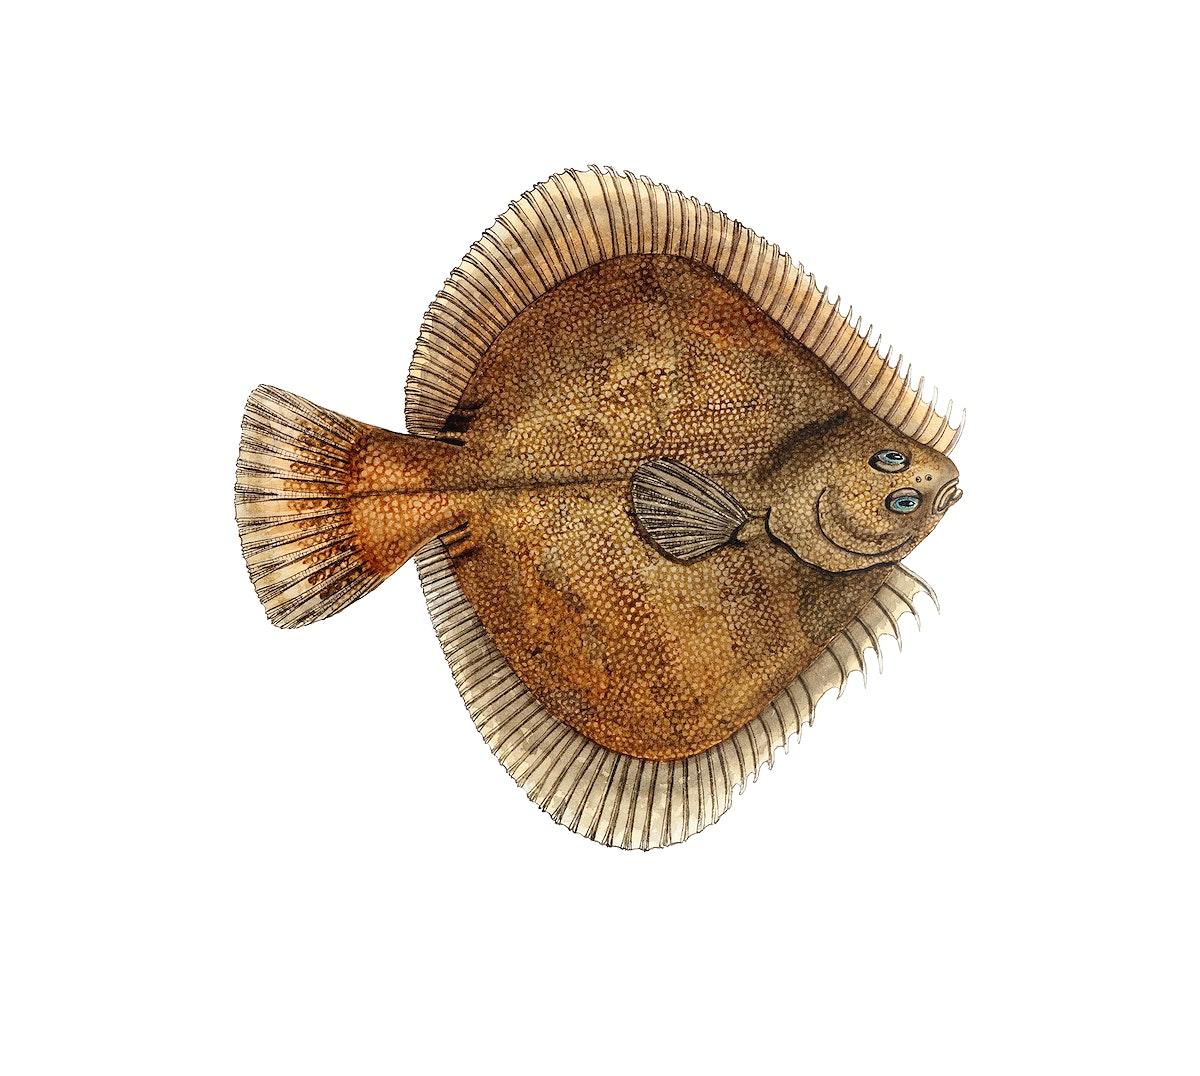 Drawing of antique fish Rhombosolea plebeia (NZ) : Sand flounder drawn by Fe. Clarke (1849-1899)